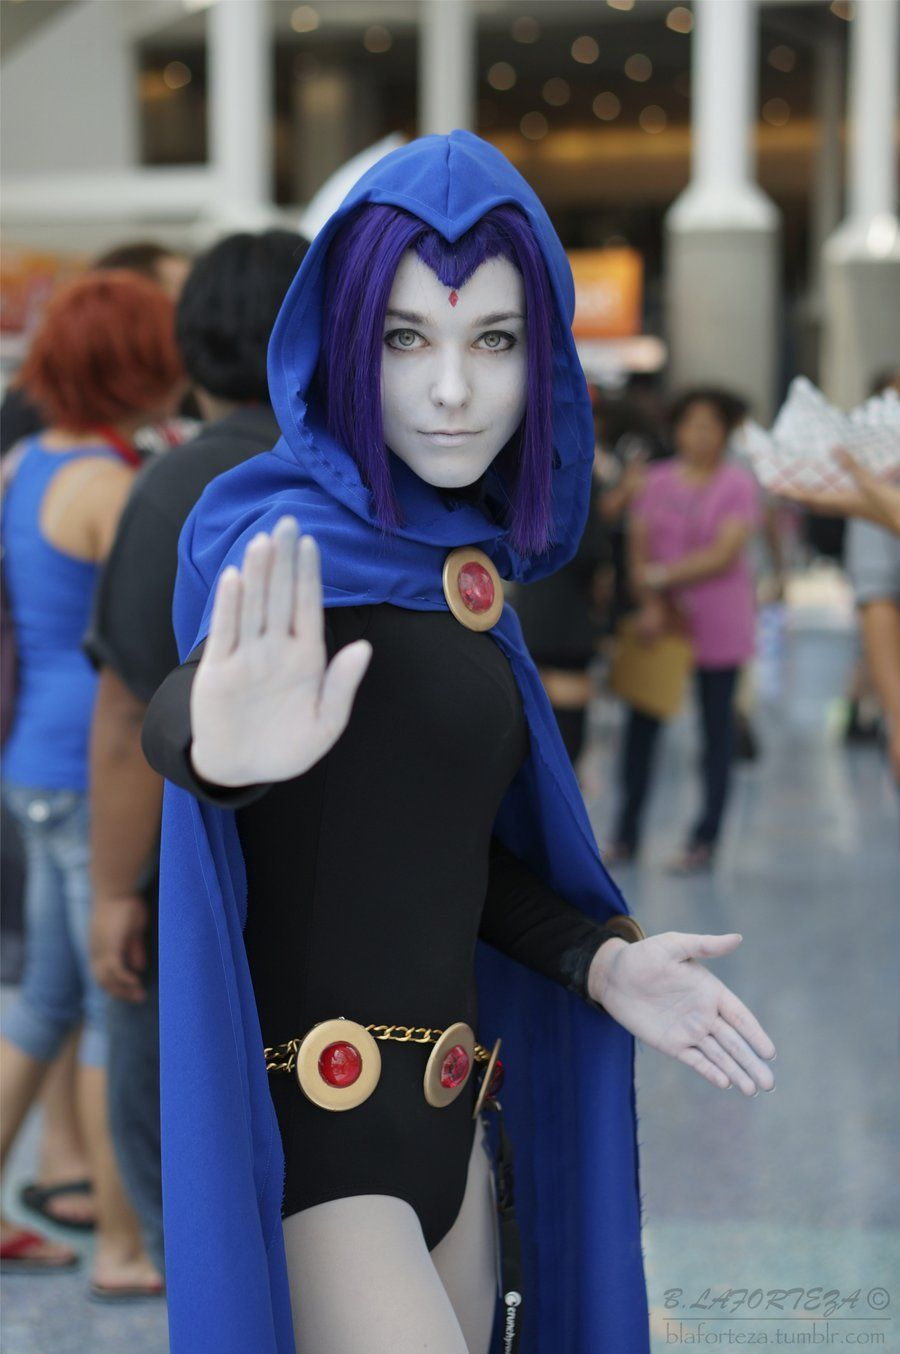 titans go raven cosplay Teen